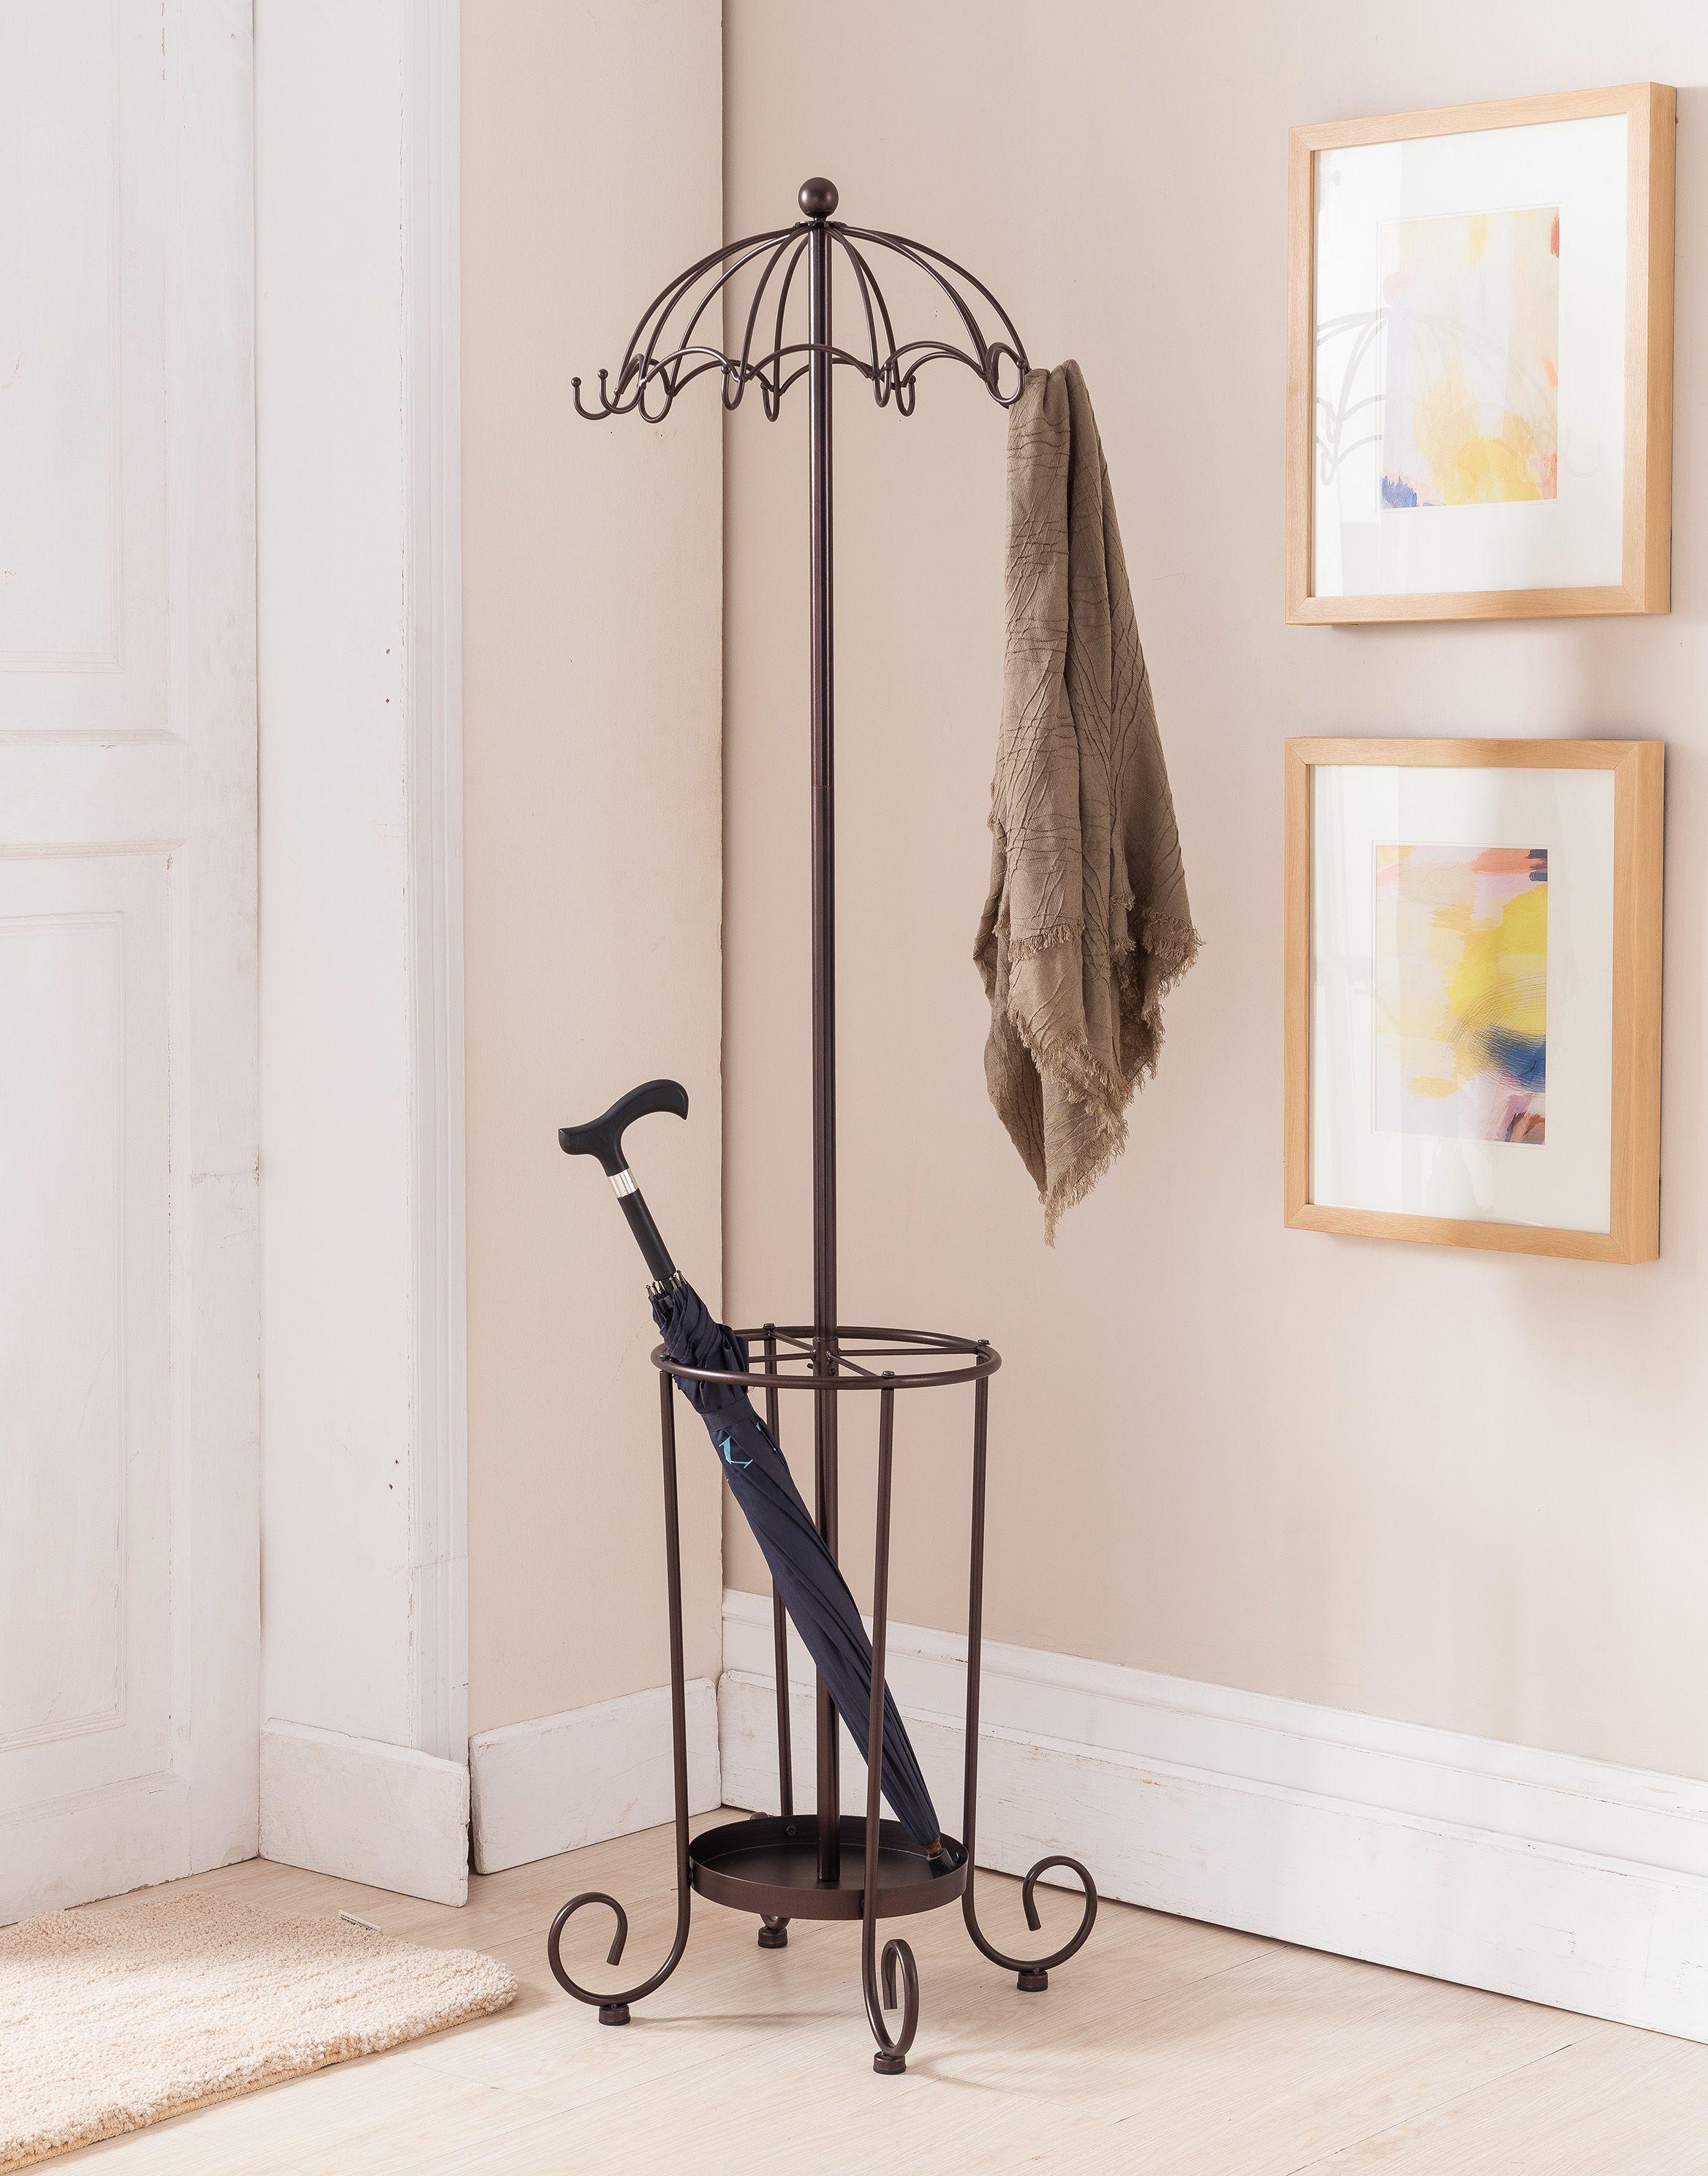 Burgess Metal Bronze Traditional Umbrella Style 10 Hook Hat Coat Rack Stand With Umbrella Holder Walmart Com Standing Coat Rack Coat Rack Diy Coat Rack